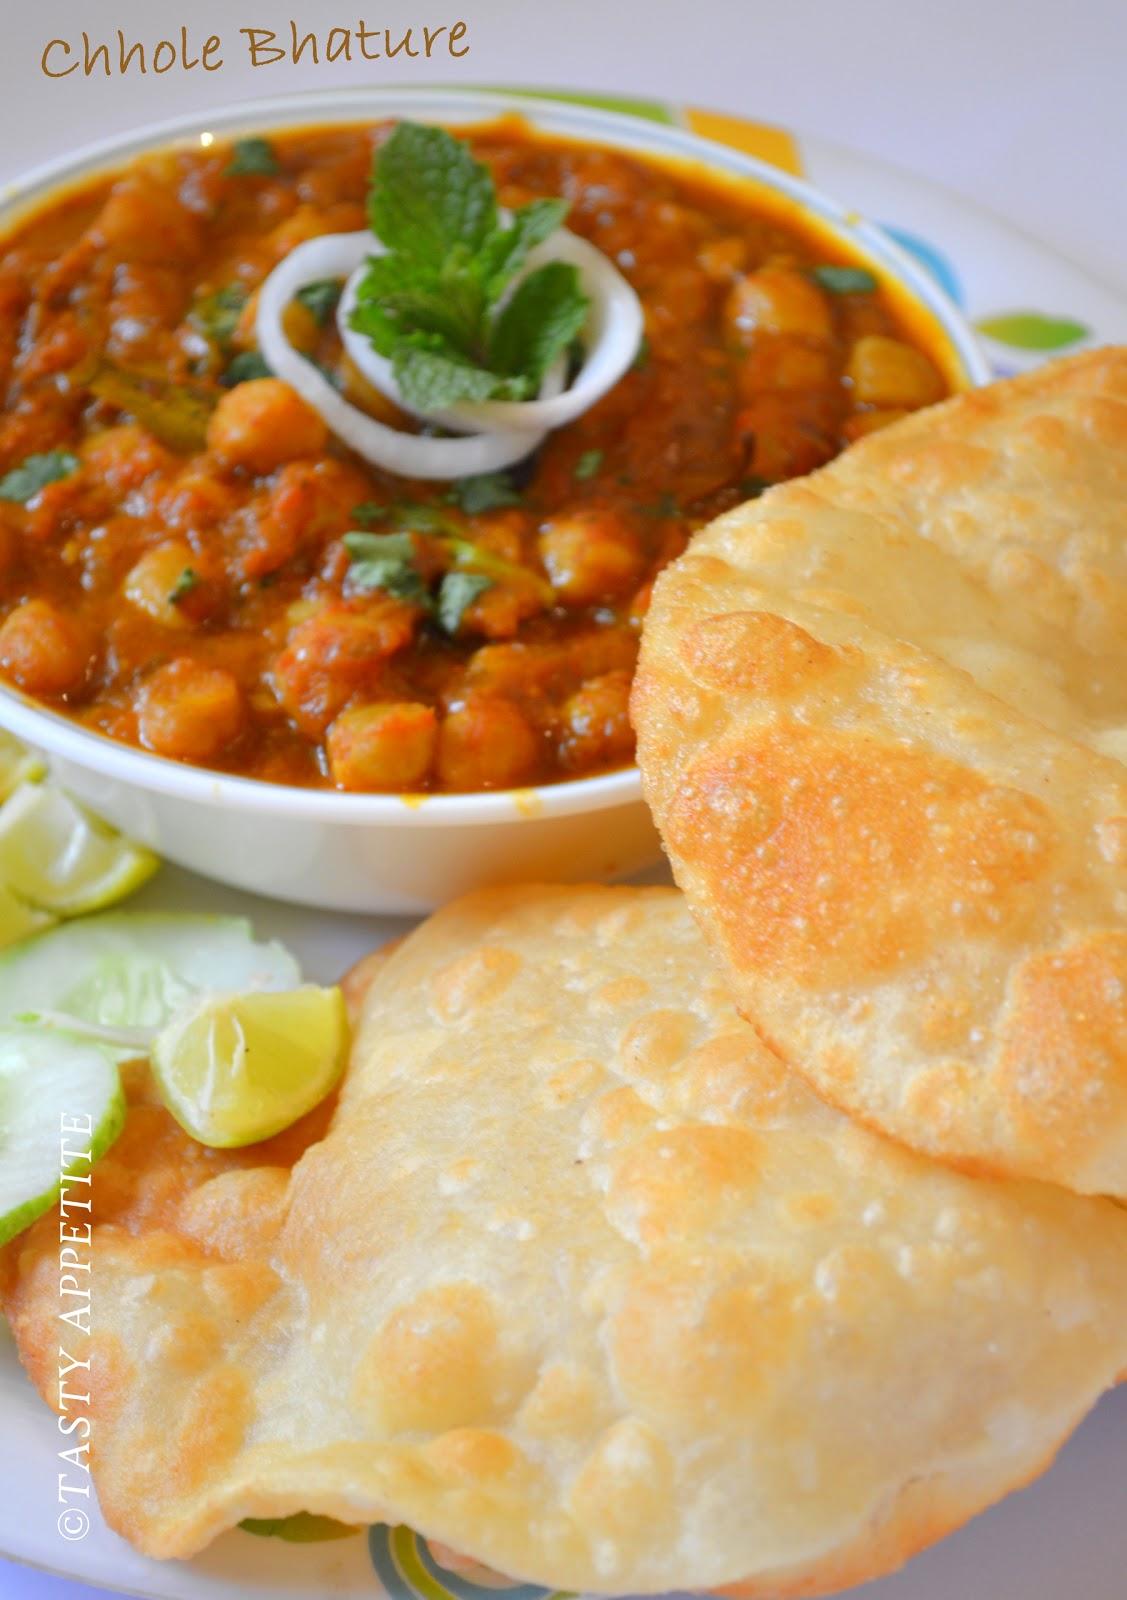 Chole bhature punjabi bhature recipe step by step forumfinder Gallery